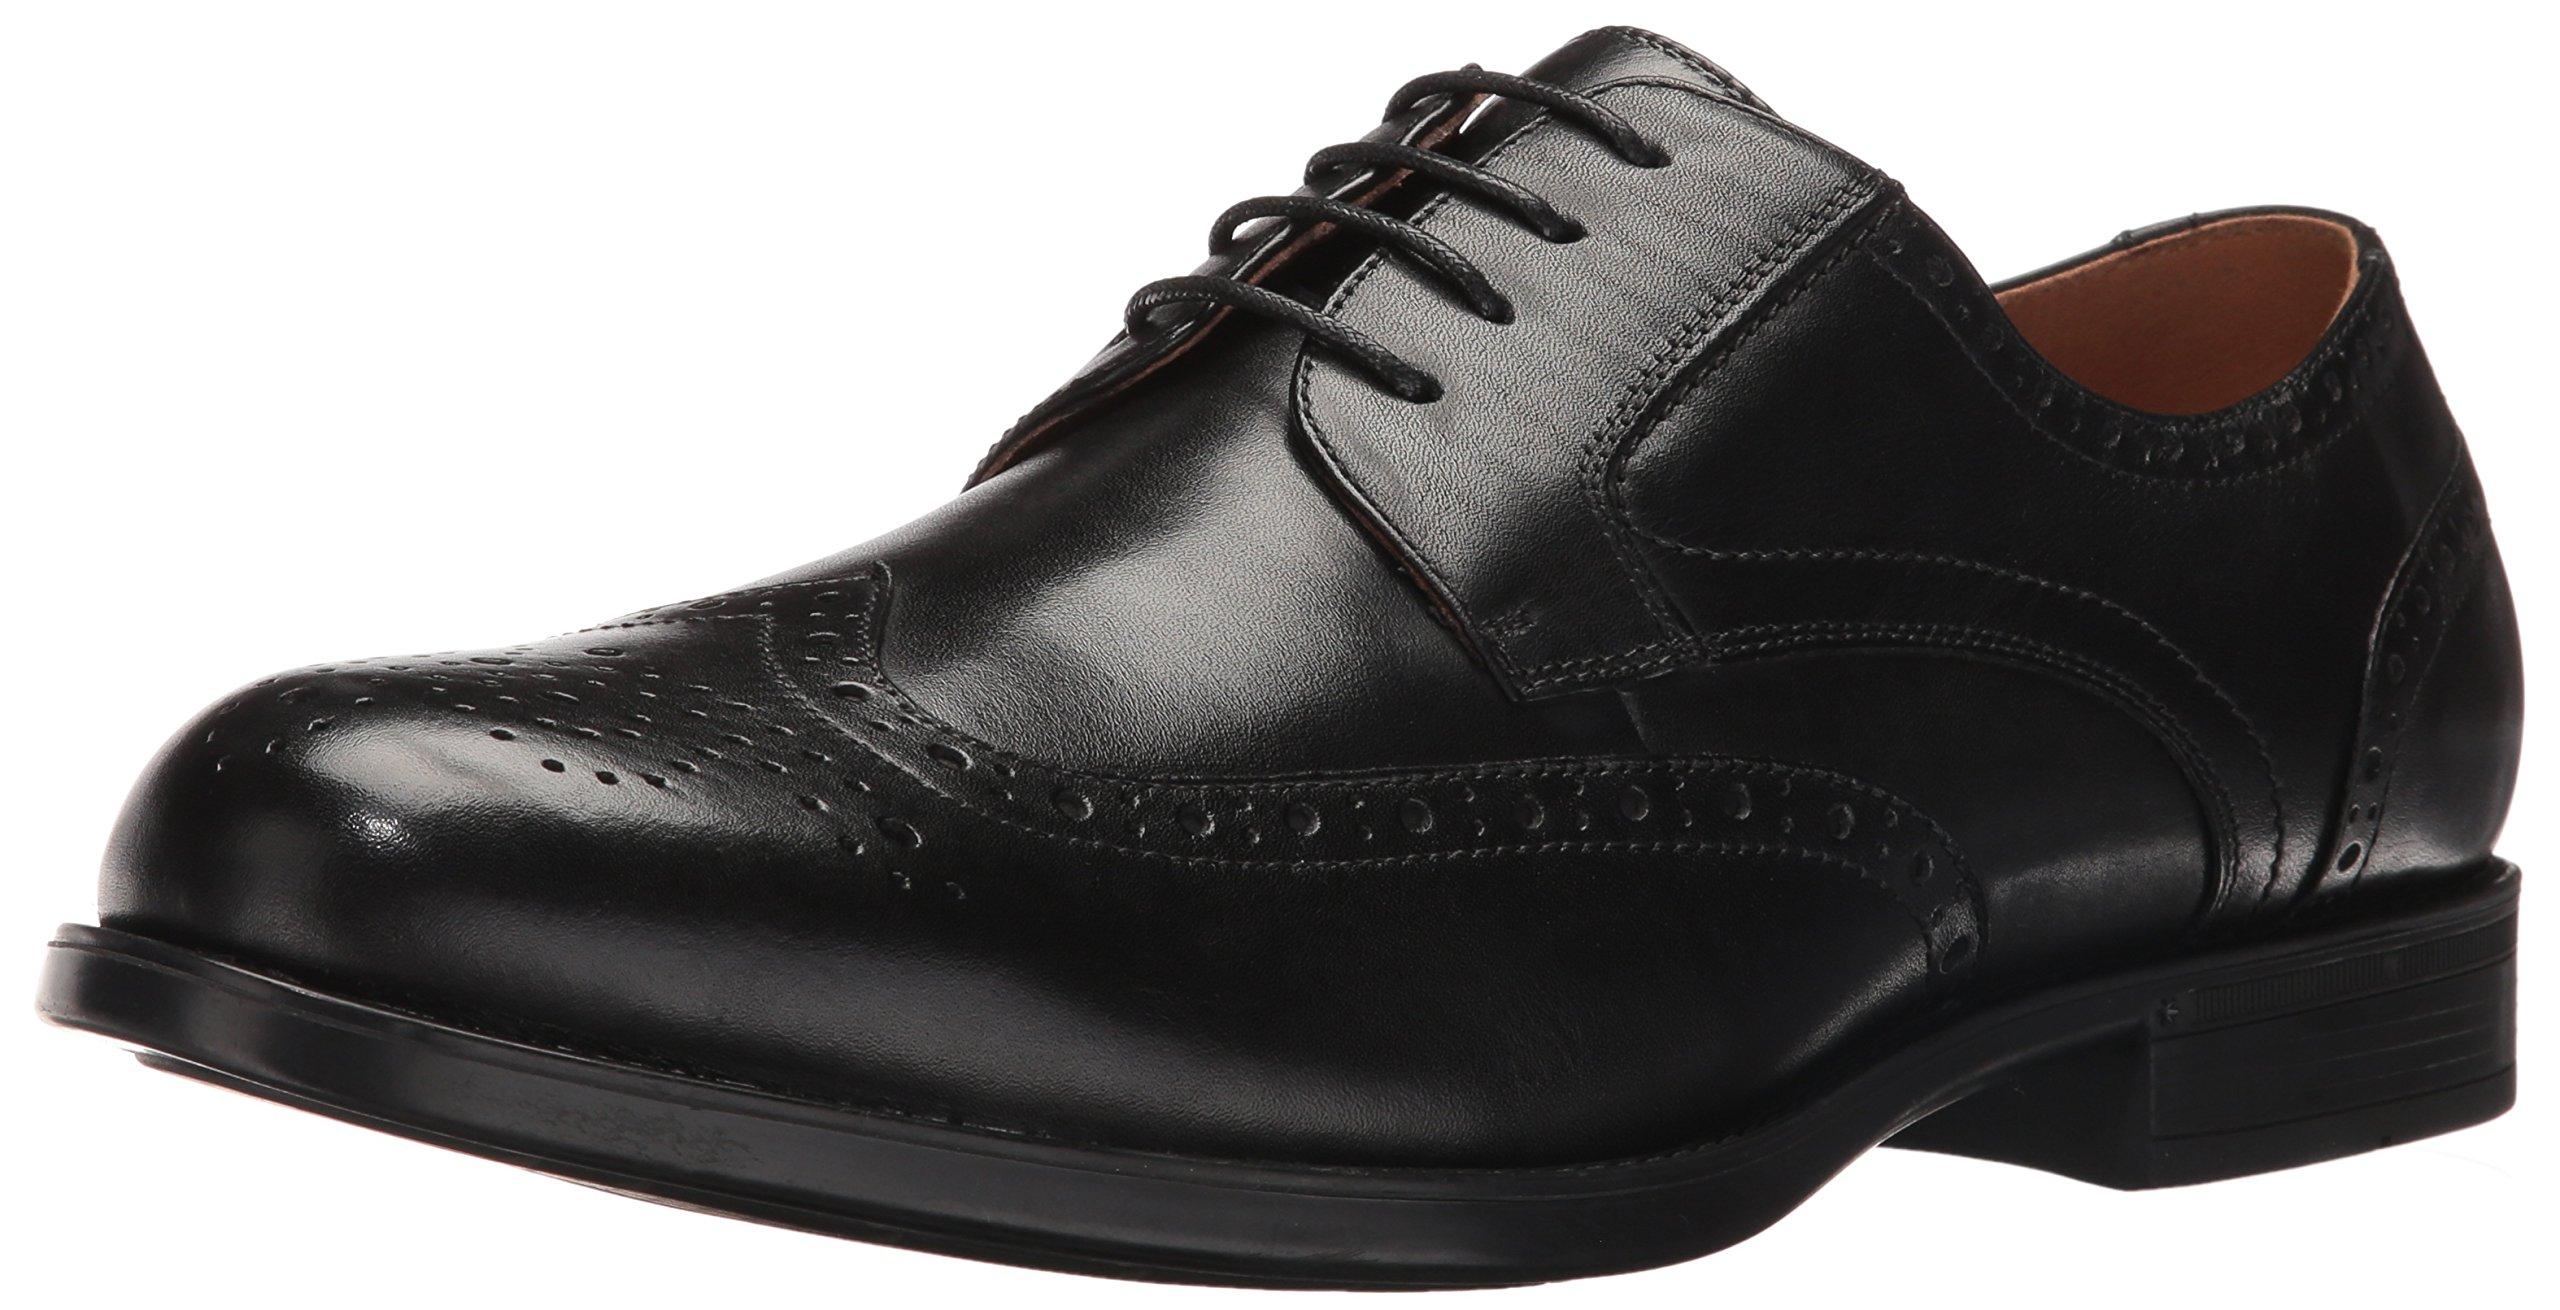 Florsheim Men's Medfield Wingtip Oxford Dress Shoe, Black, 9.5 D US